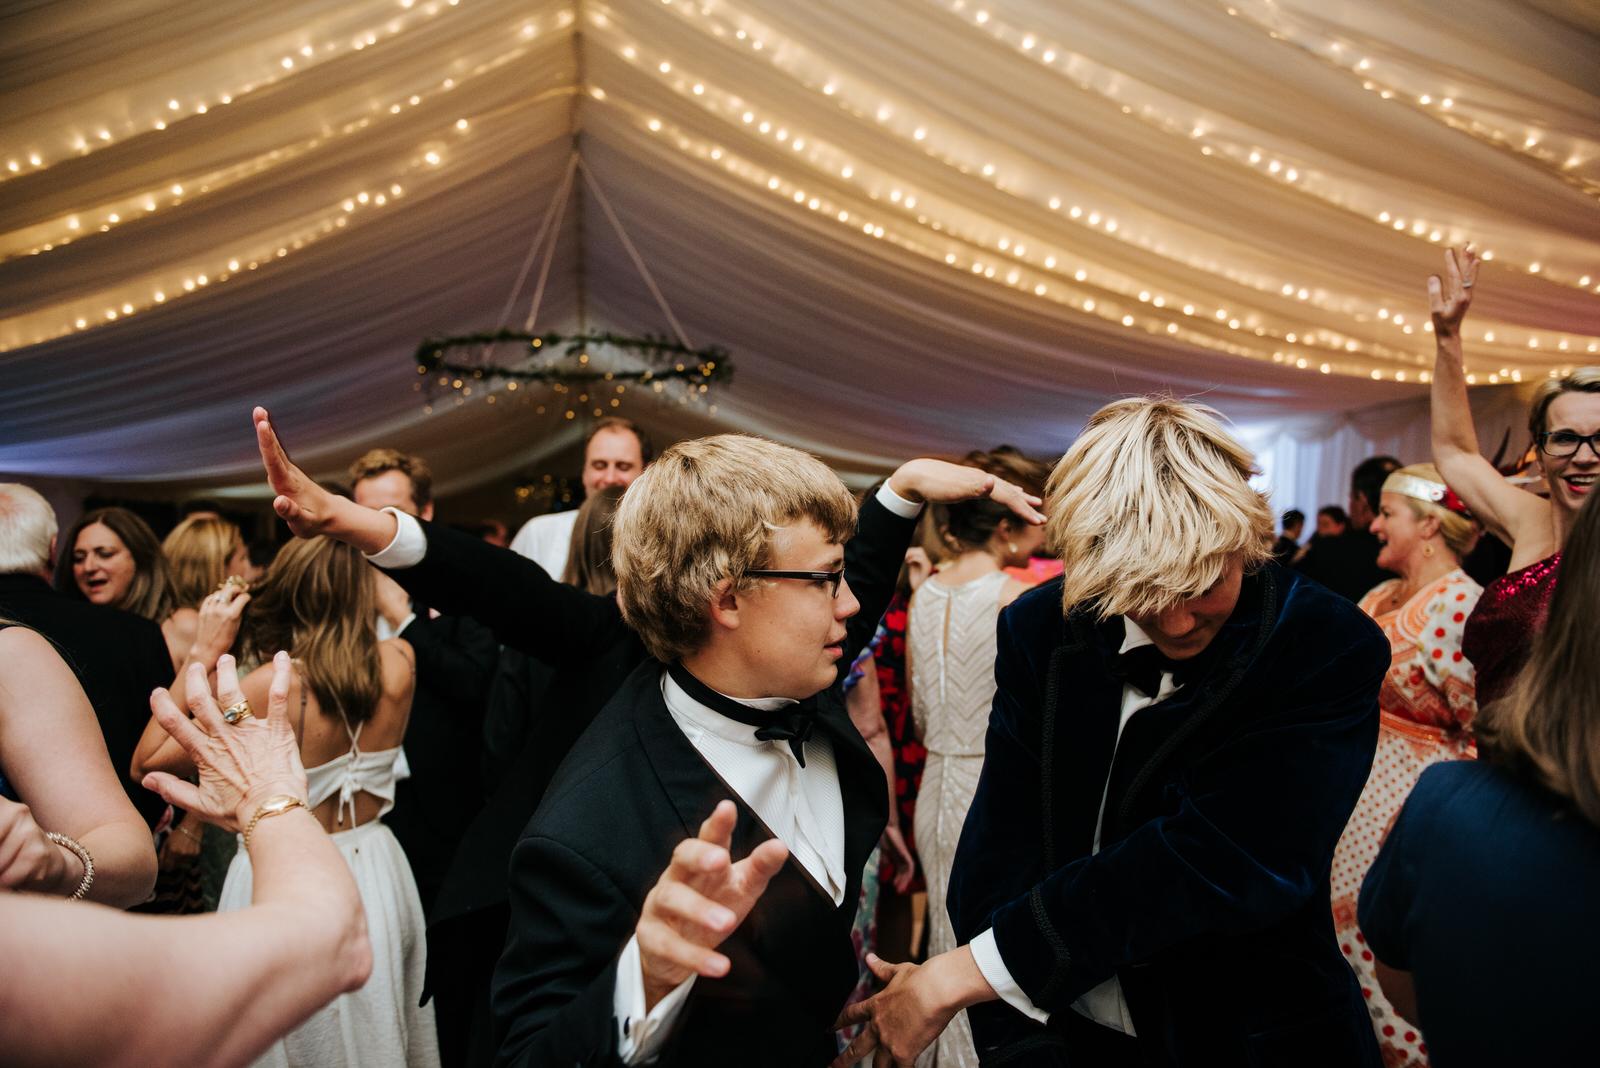 Guests flood the dancefloor under marquee fairylights